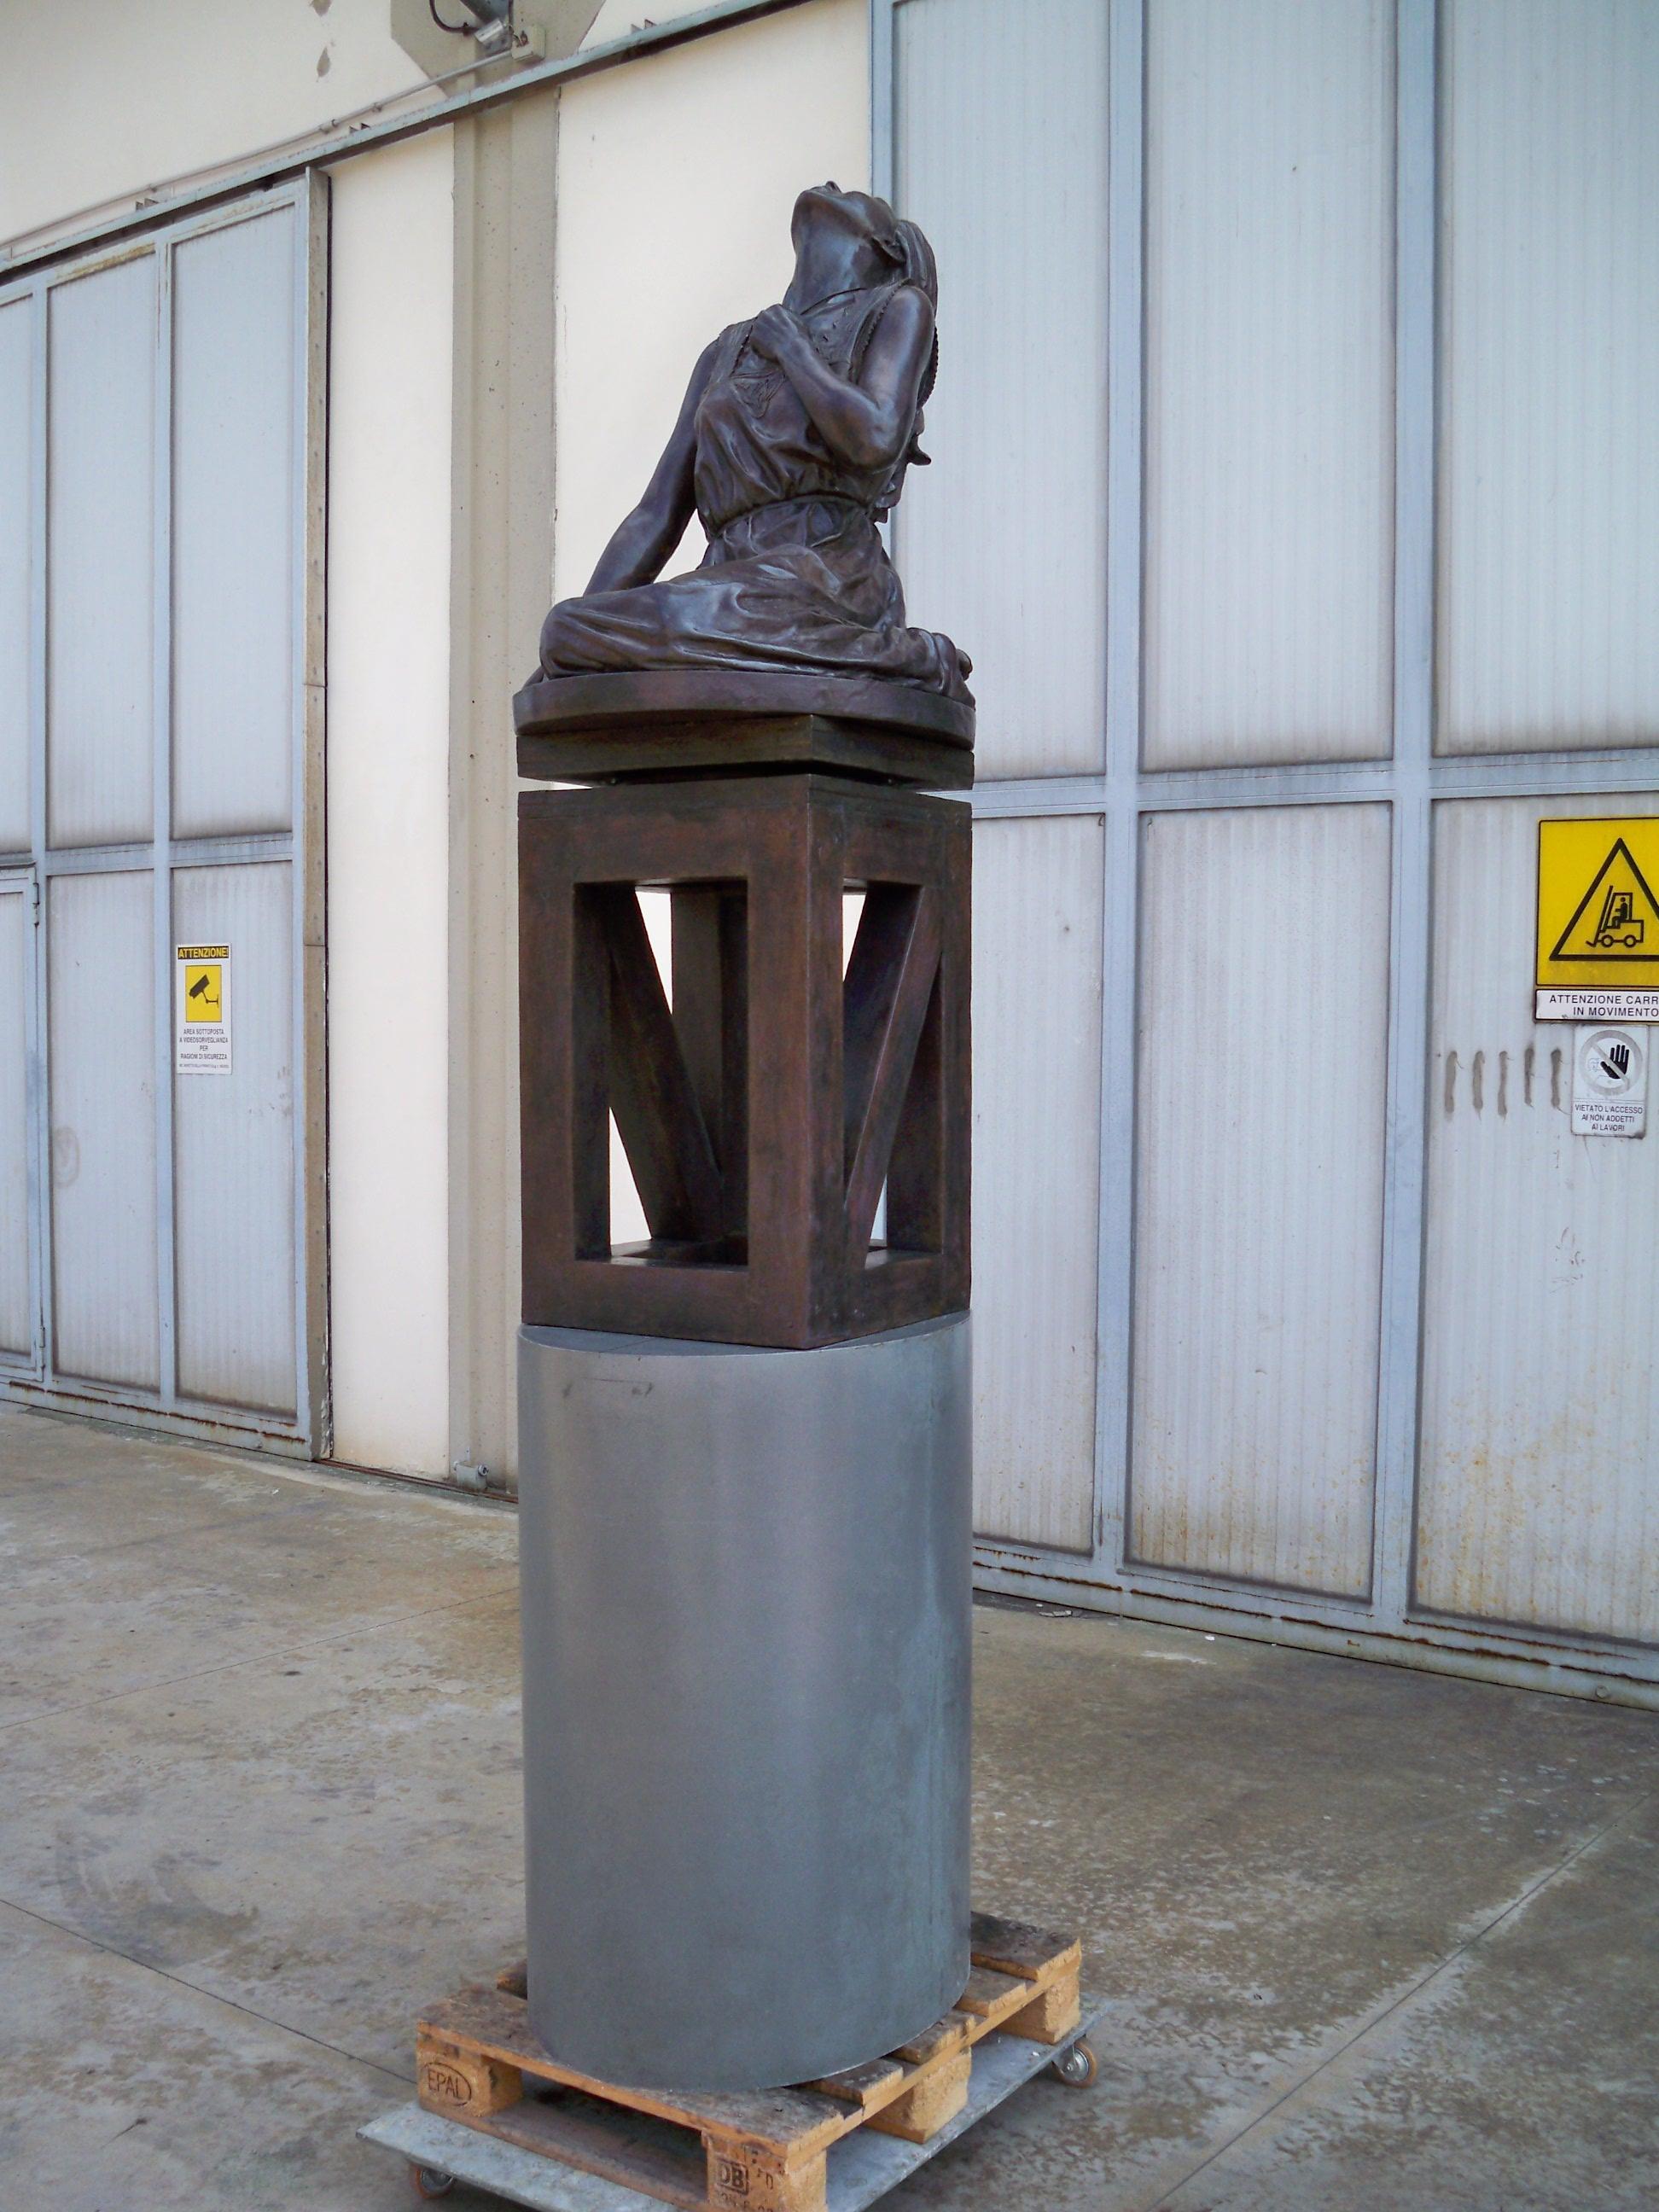 Puckey Thom, Eline Vere h. cm. 180, collocata a Den Haag (L'Aja) (NL)